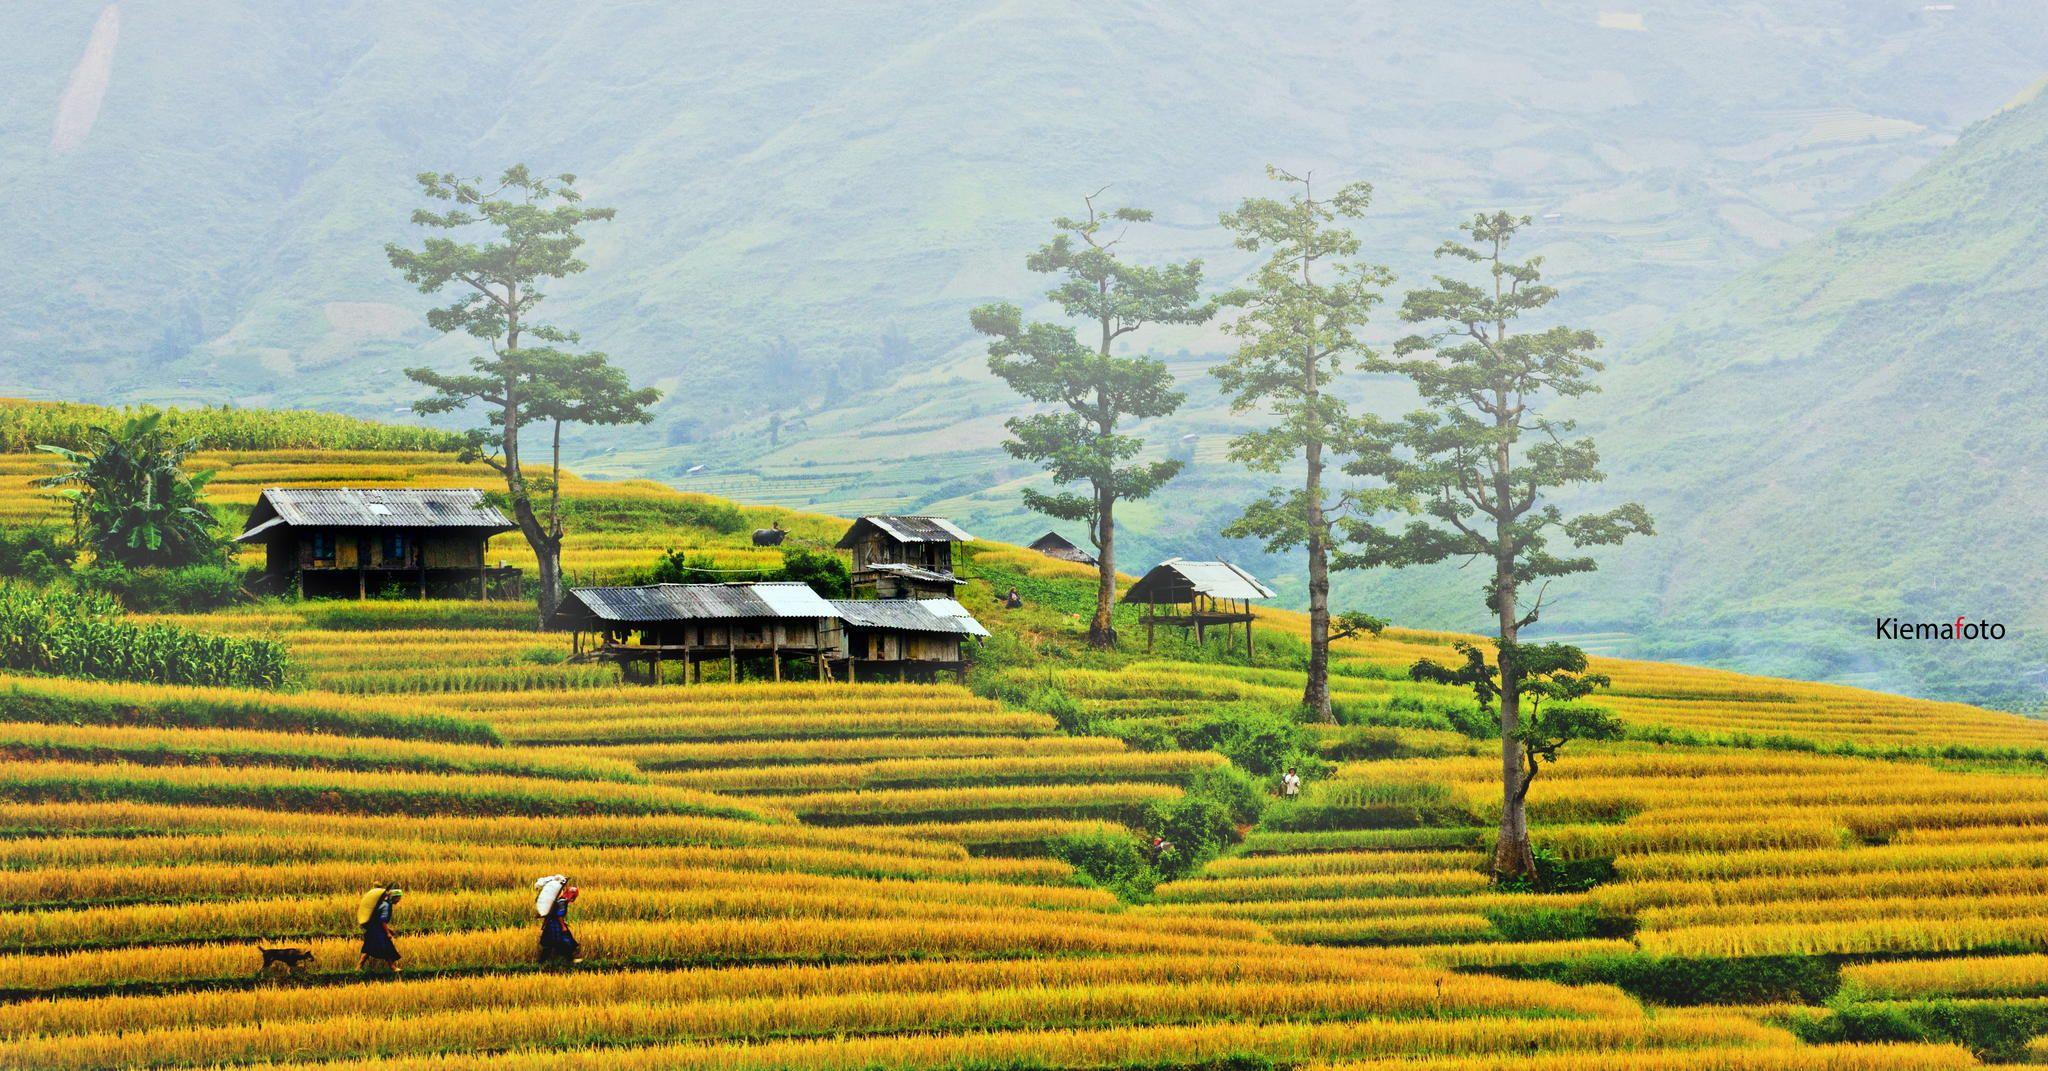 Moc Chau is so beautiful in the ripen rice season